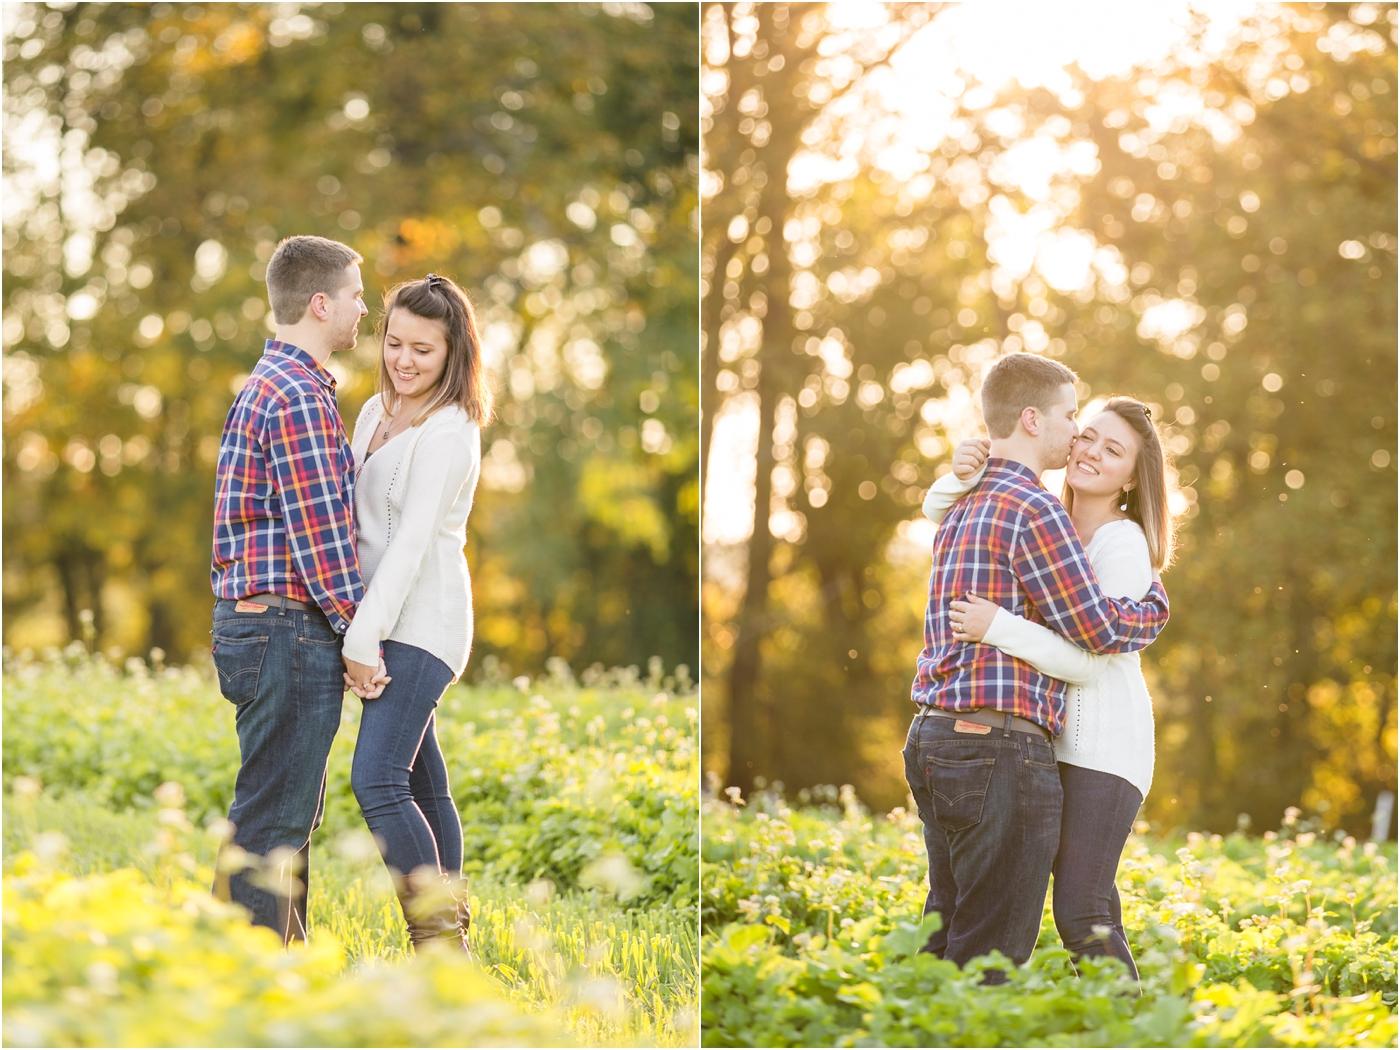 Larriland-Farm-Engagement-Photo_0017.jpg